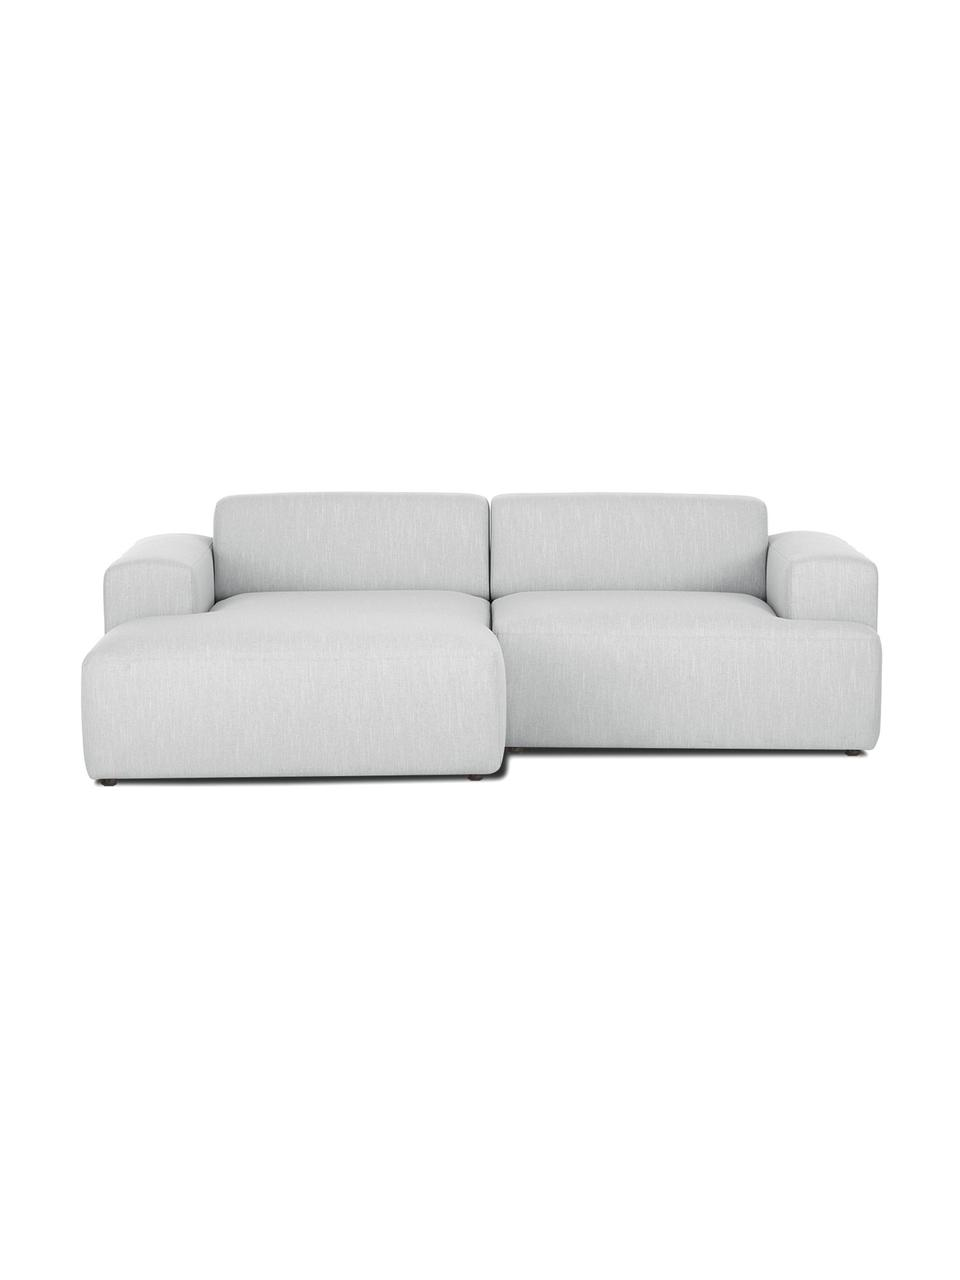 Ecksofa Melva (3-Sitzer) in Hellgrau, Bezug: 100% Polyester Der hochwe, Gestell: Massives Kiefernholz, FSC, Füße: Kunststoff, Webstoff Hellgrau, B 239 x T 143 cm